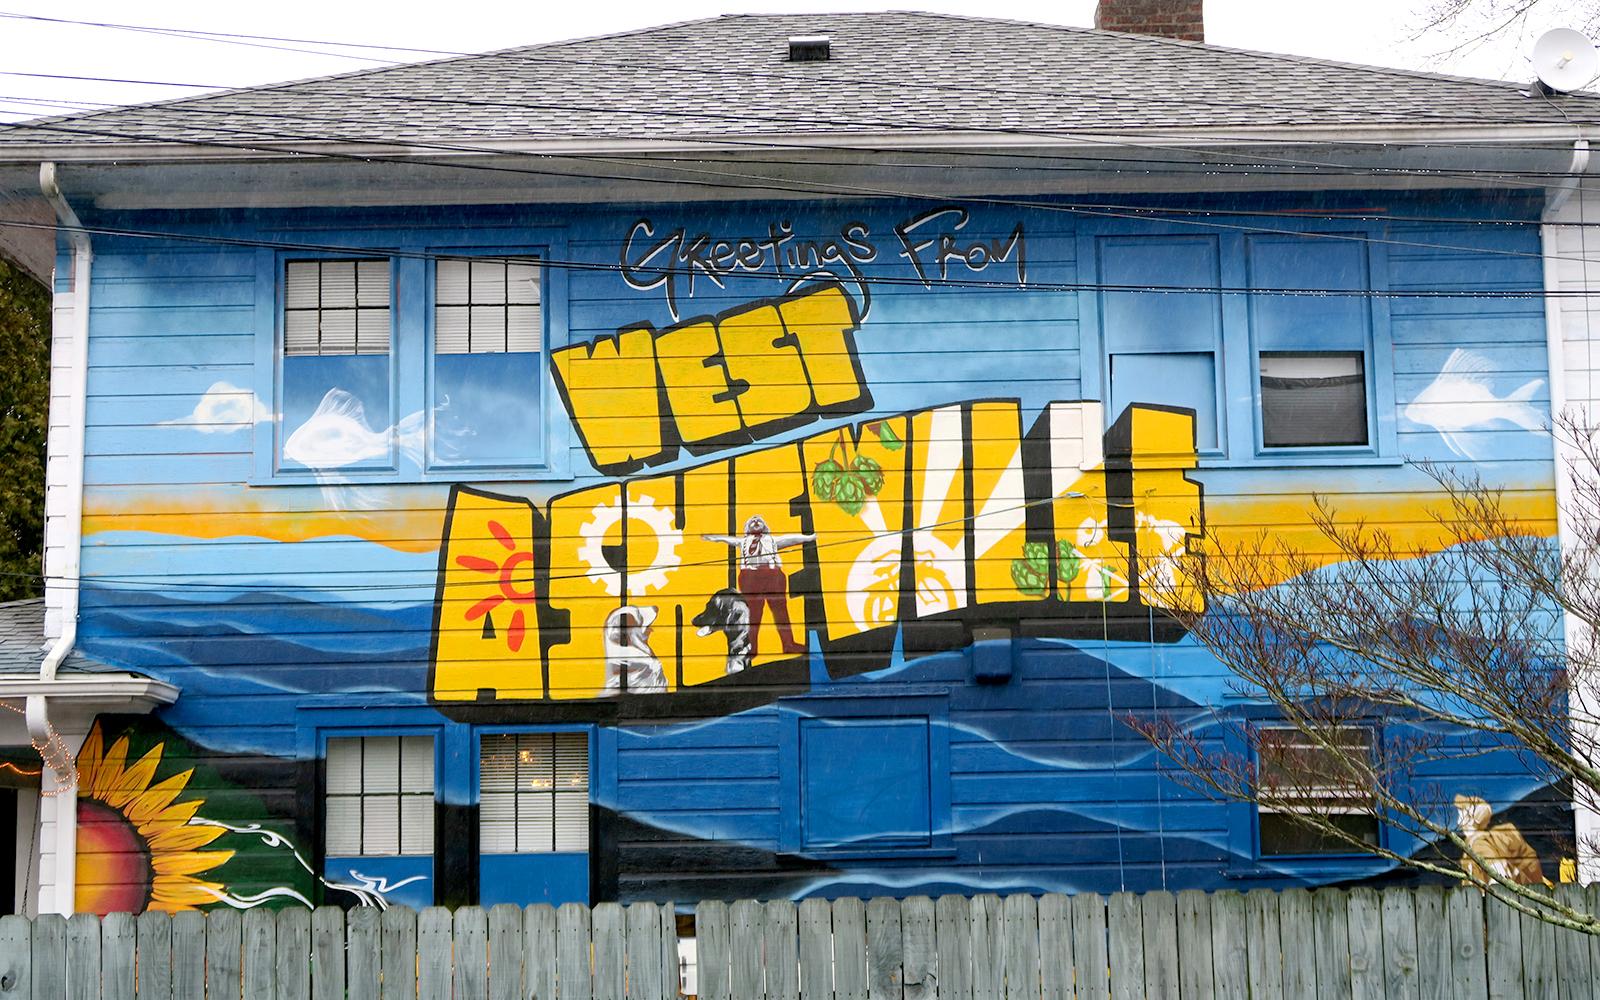 West-Asheville-mural-Haywood-Road.jpg?mtime=20180321141751#asset:101020